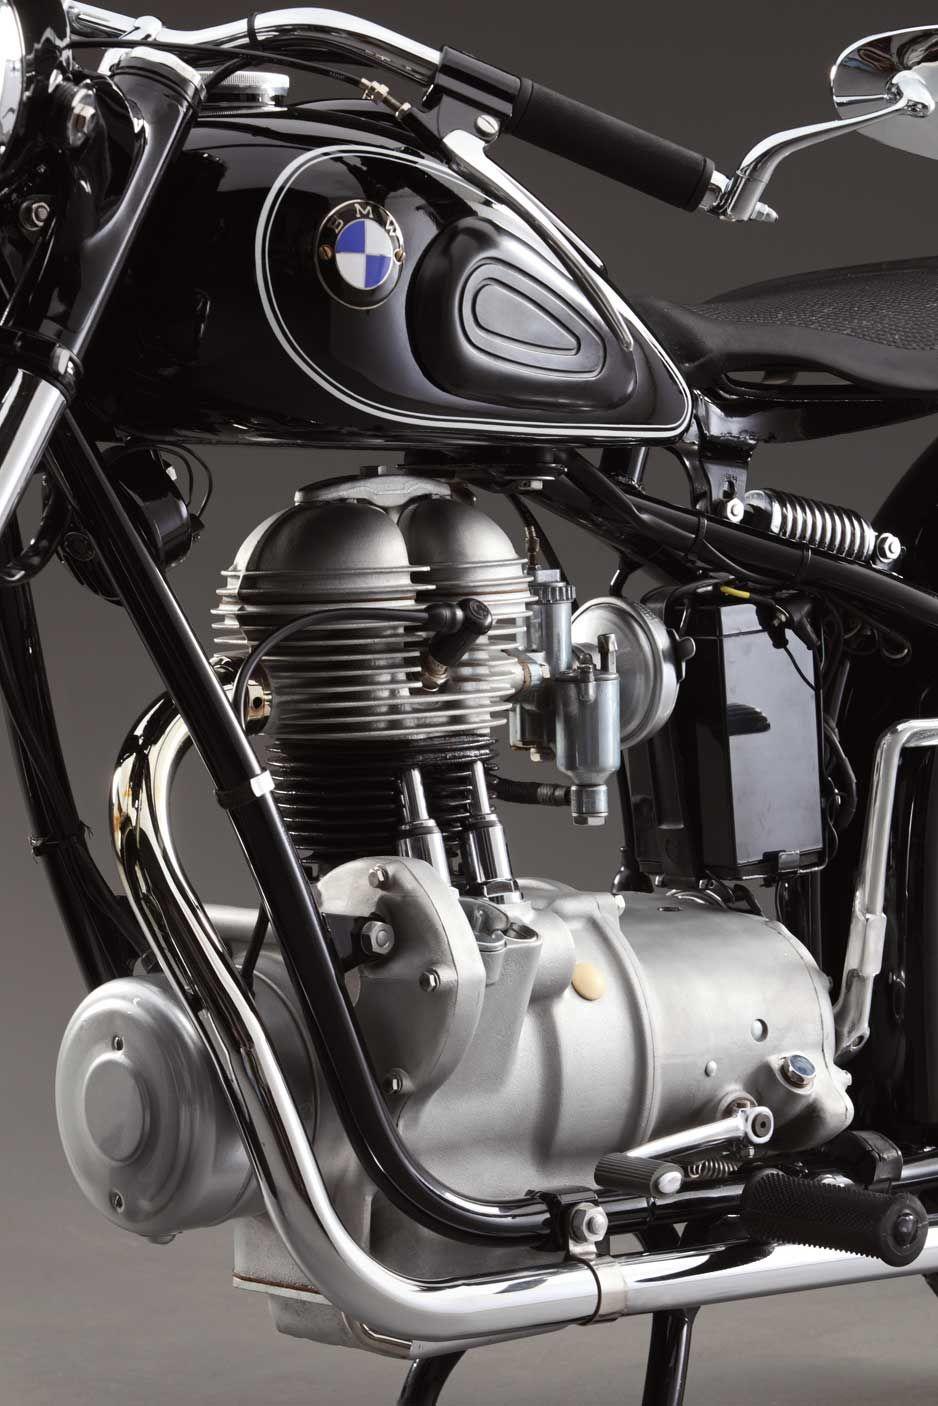 bmw r25 2 gb pinterest bmw bmw motorcycles and engine. Black Bedroom Furniture Sets. Home Design Ideas